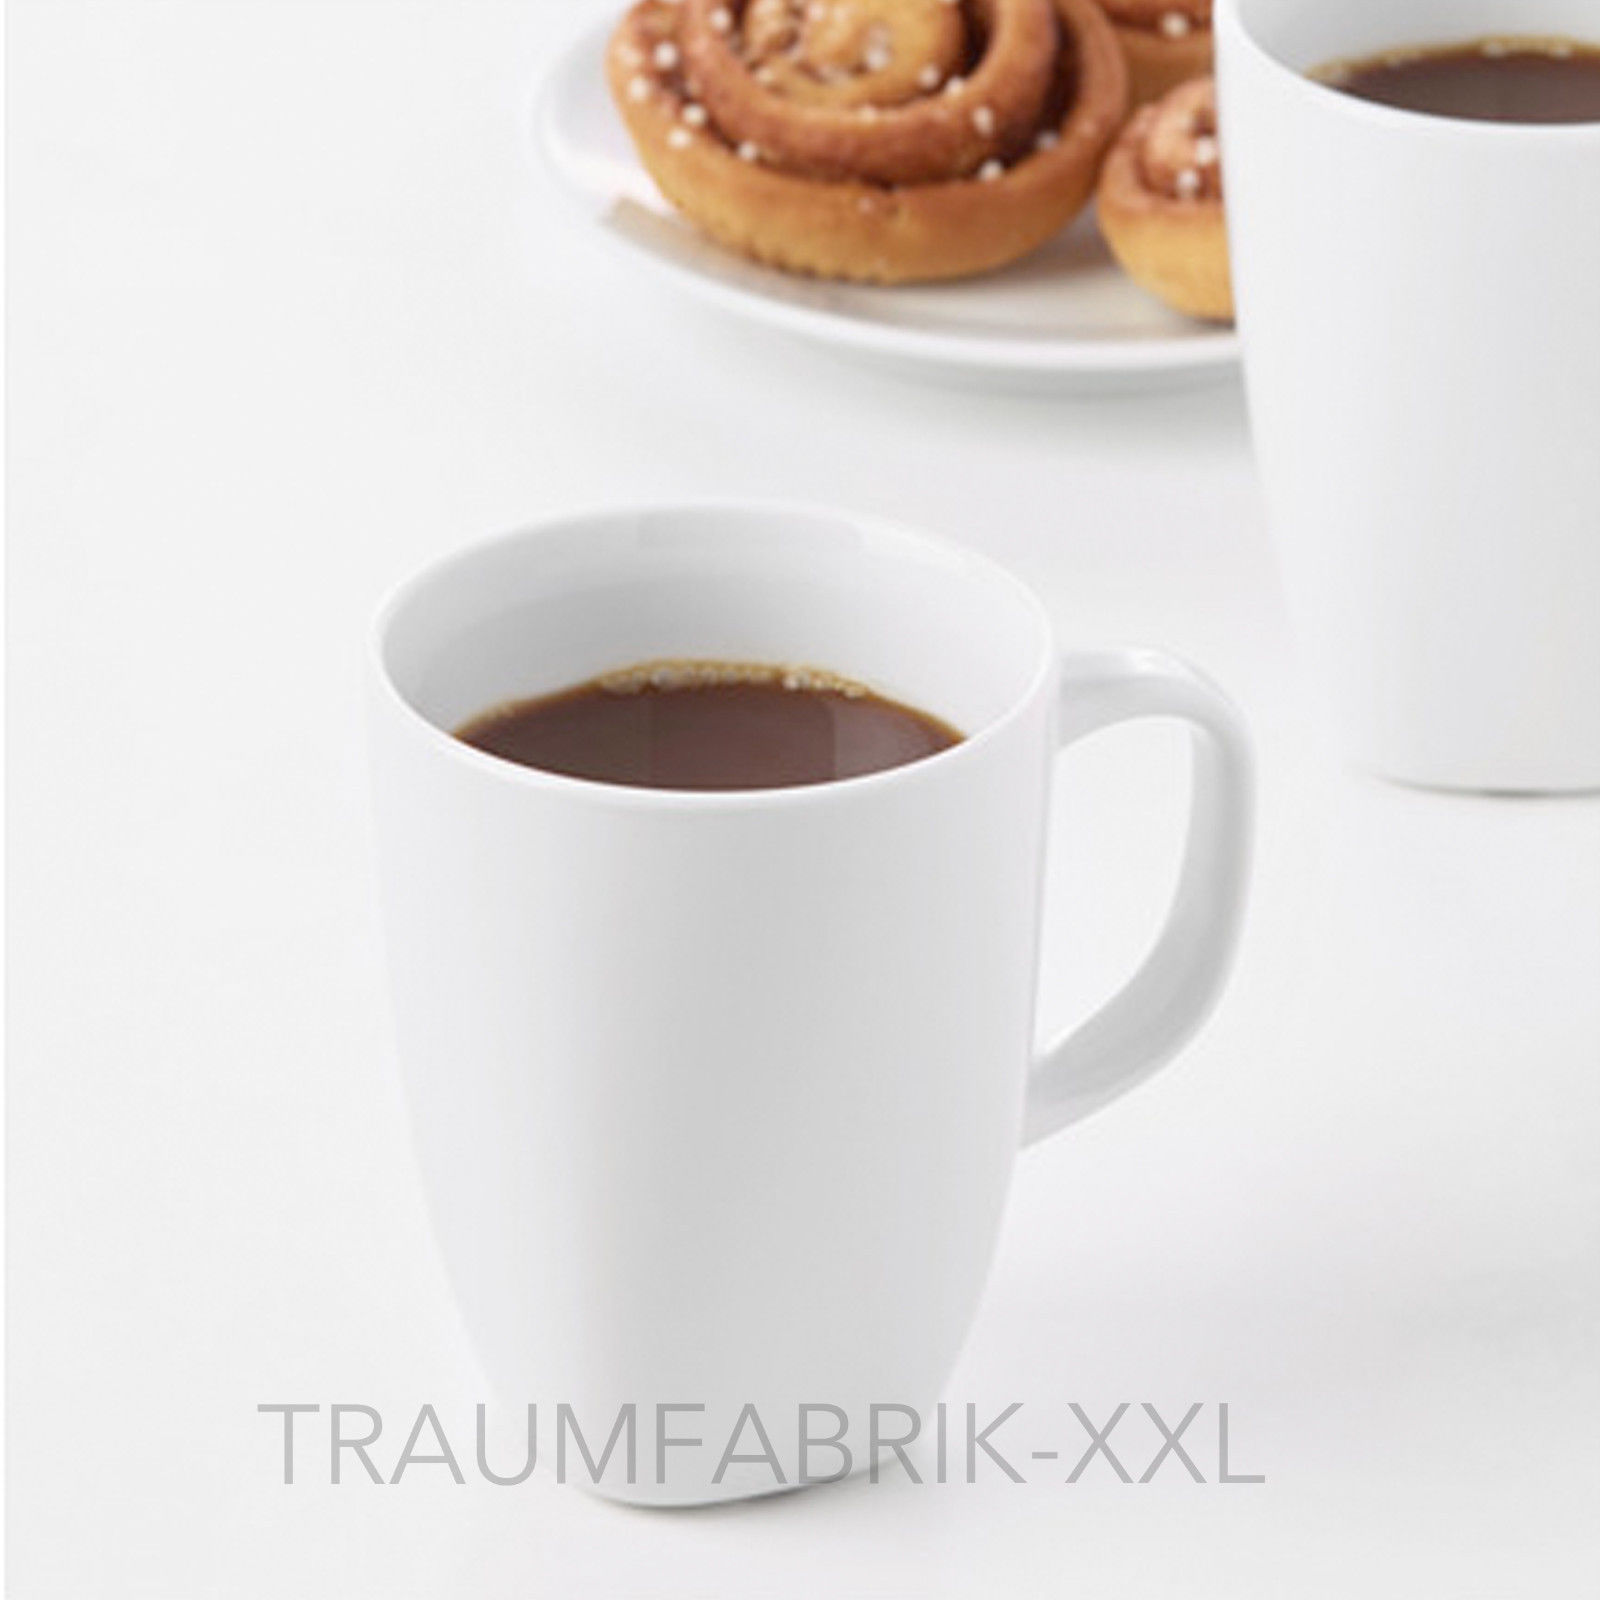 10 x ikea v rdera kaffeebecher wei kaffee tasse becher kaffeepott tassen 30cl traumfabrik xxl. Black Bedroom Furniture Sets. Home Design Ideas